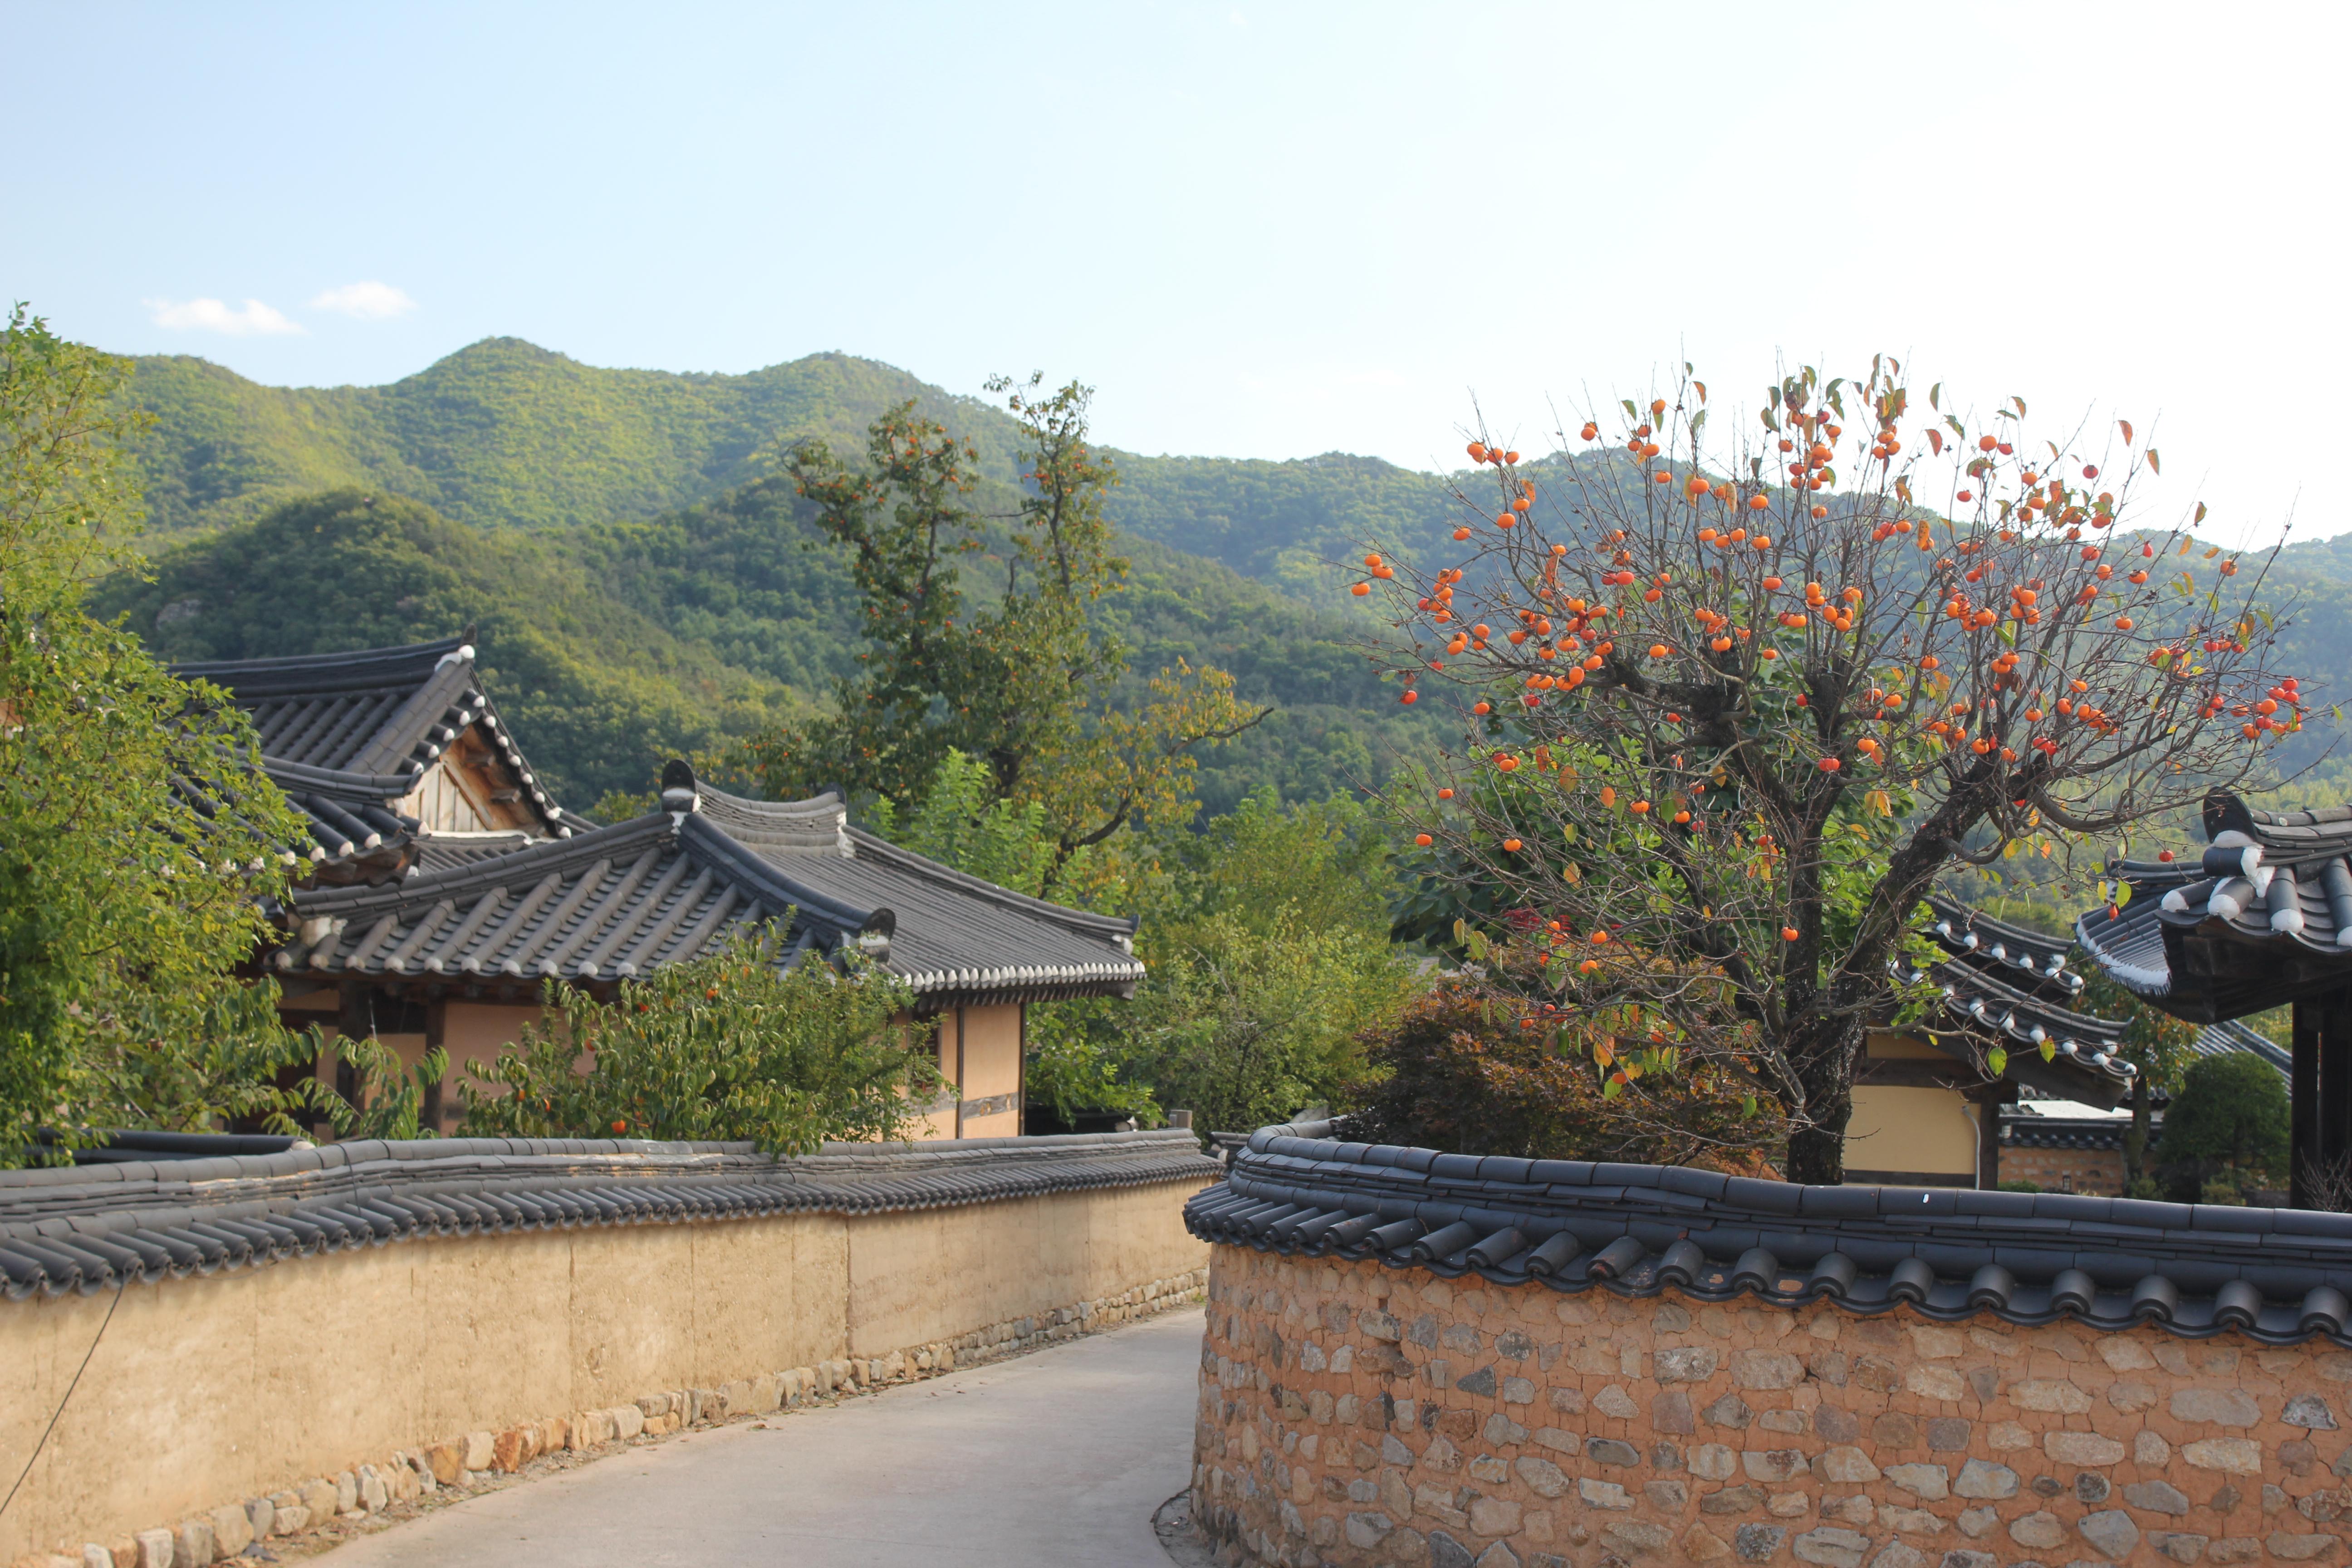 169 - South Korea - Eric Pignolo.JPG